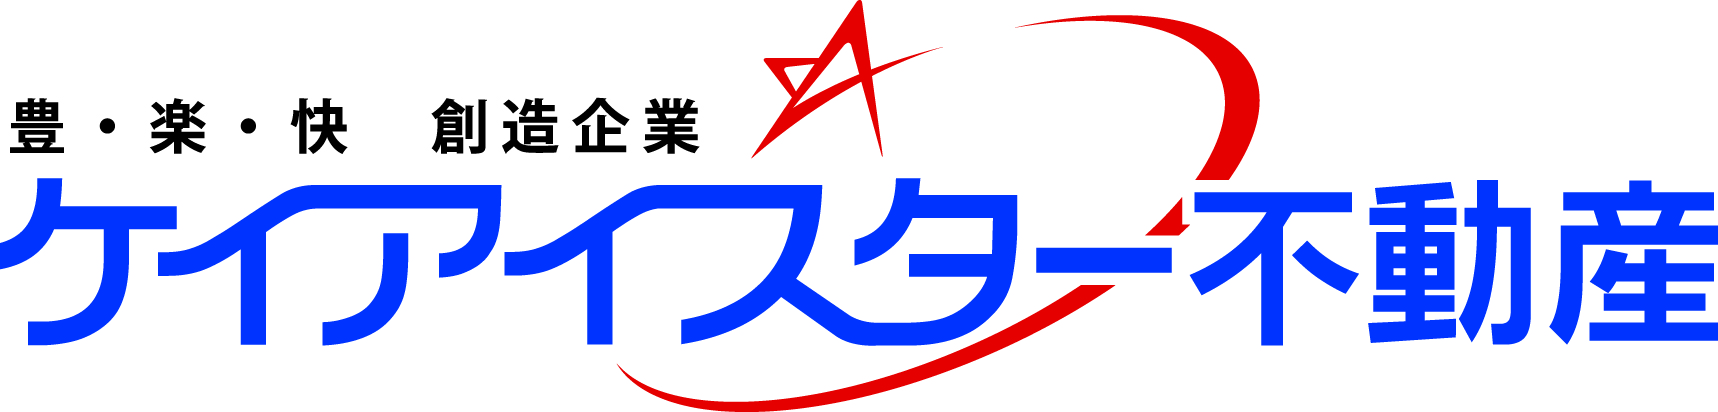 Tokyoで北欧の暮らしを満喫 江戸川区に全19棟の北欧ハウス登場! 「The Tokyo KIzuna town」 2014年1月18日販売開始